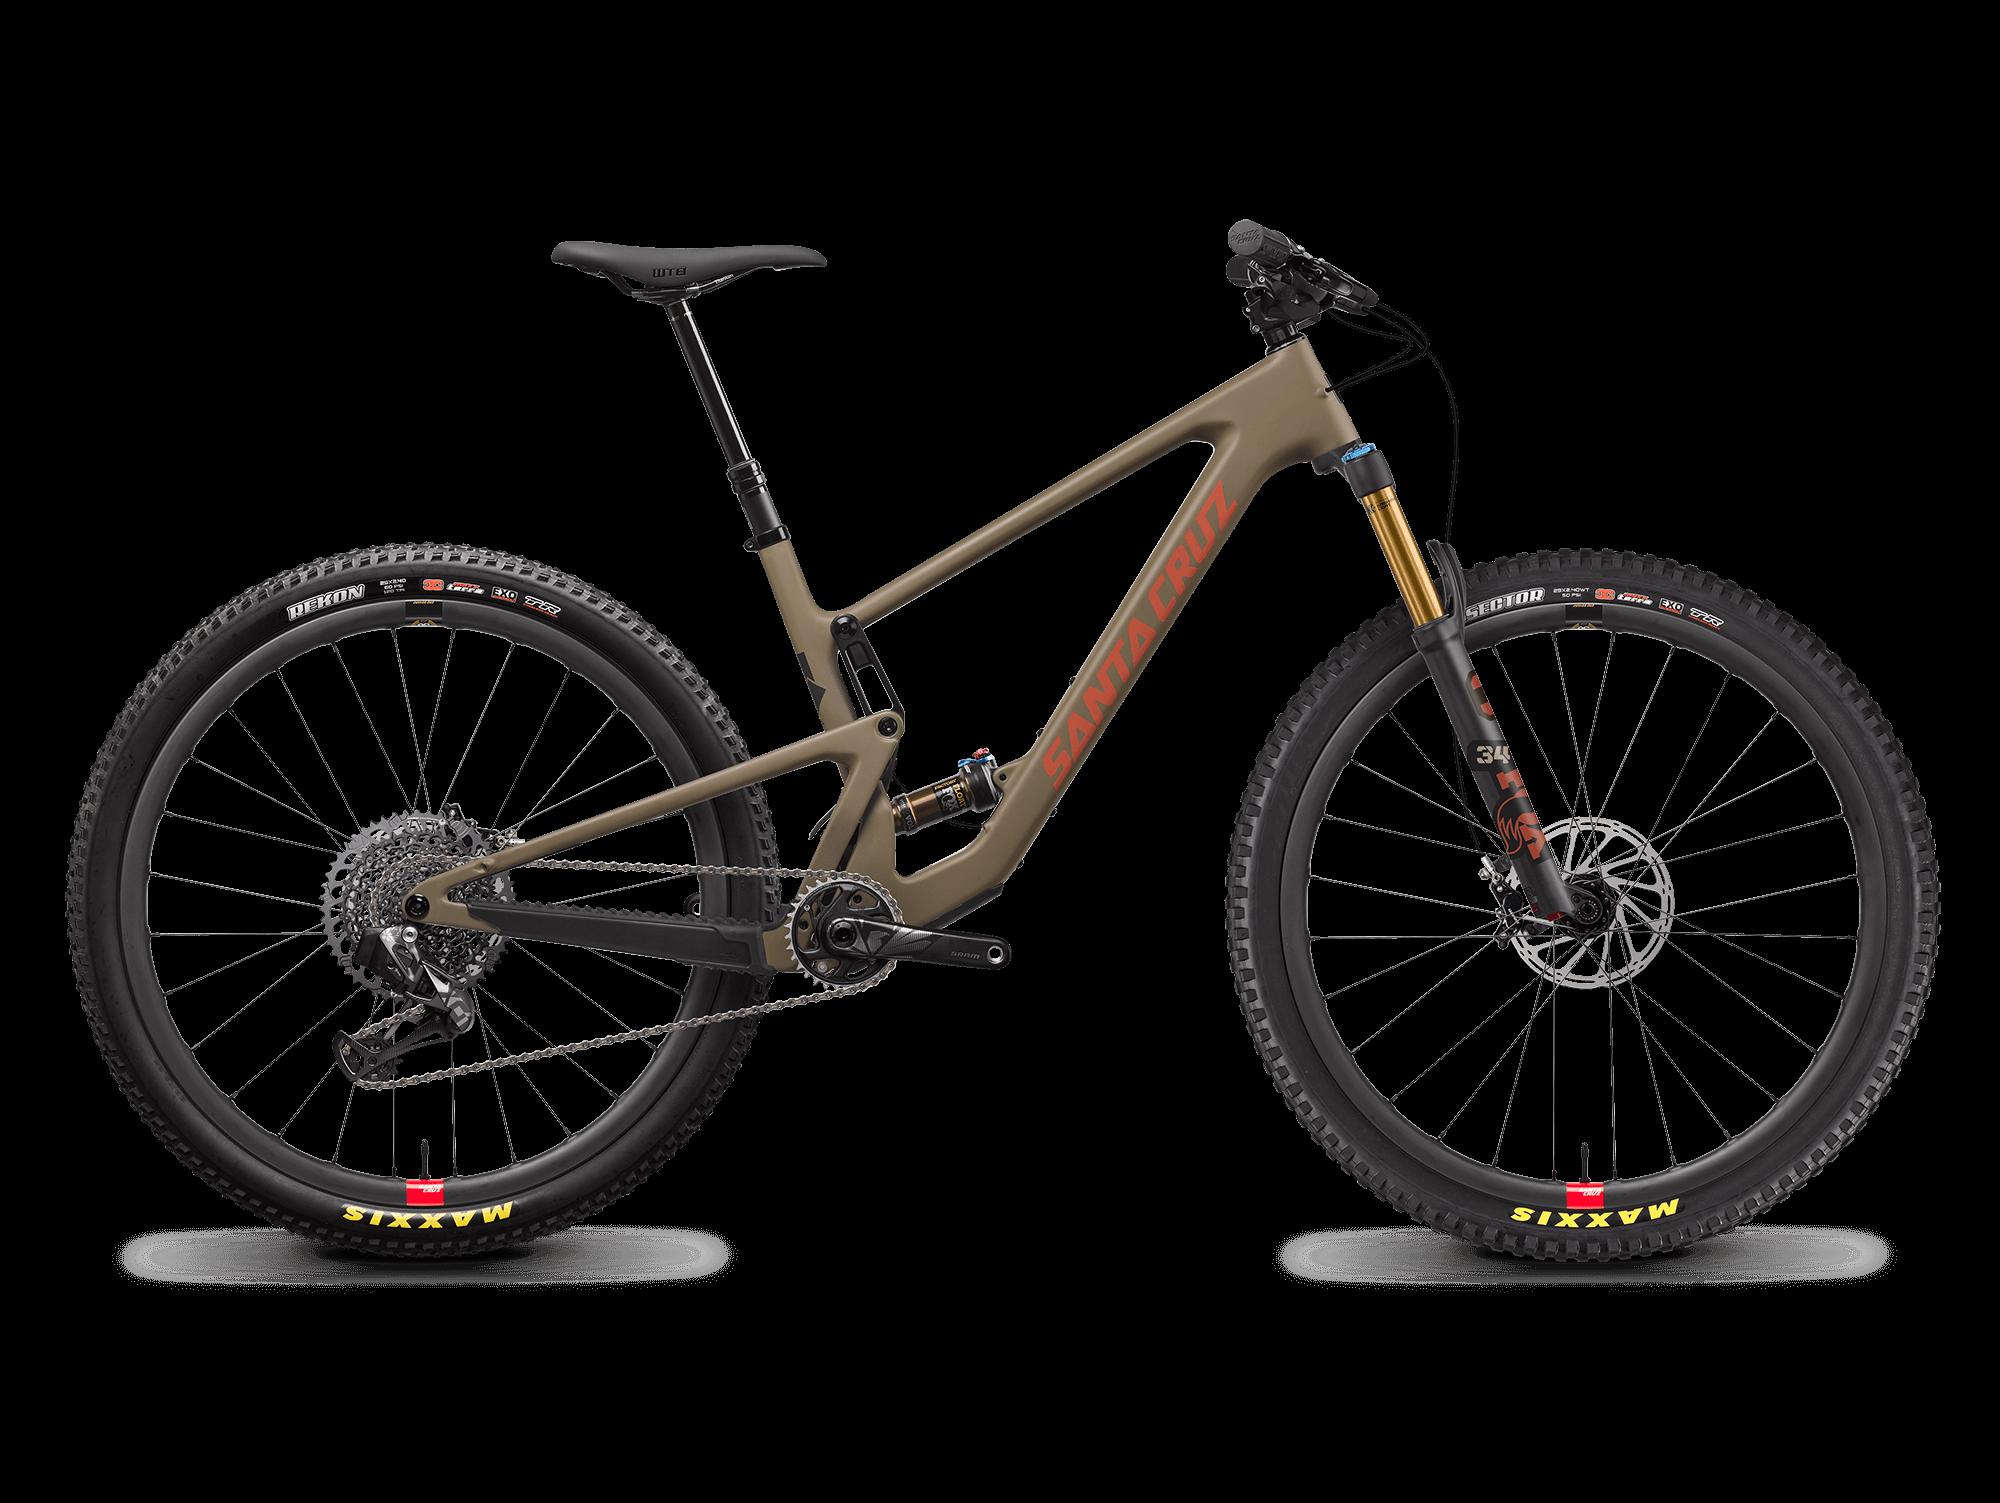 Santa Cruz Tallboy V4 CC X01 AXS Kit Reserve | Modell 2022